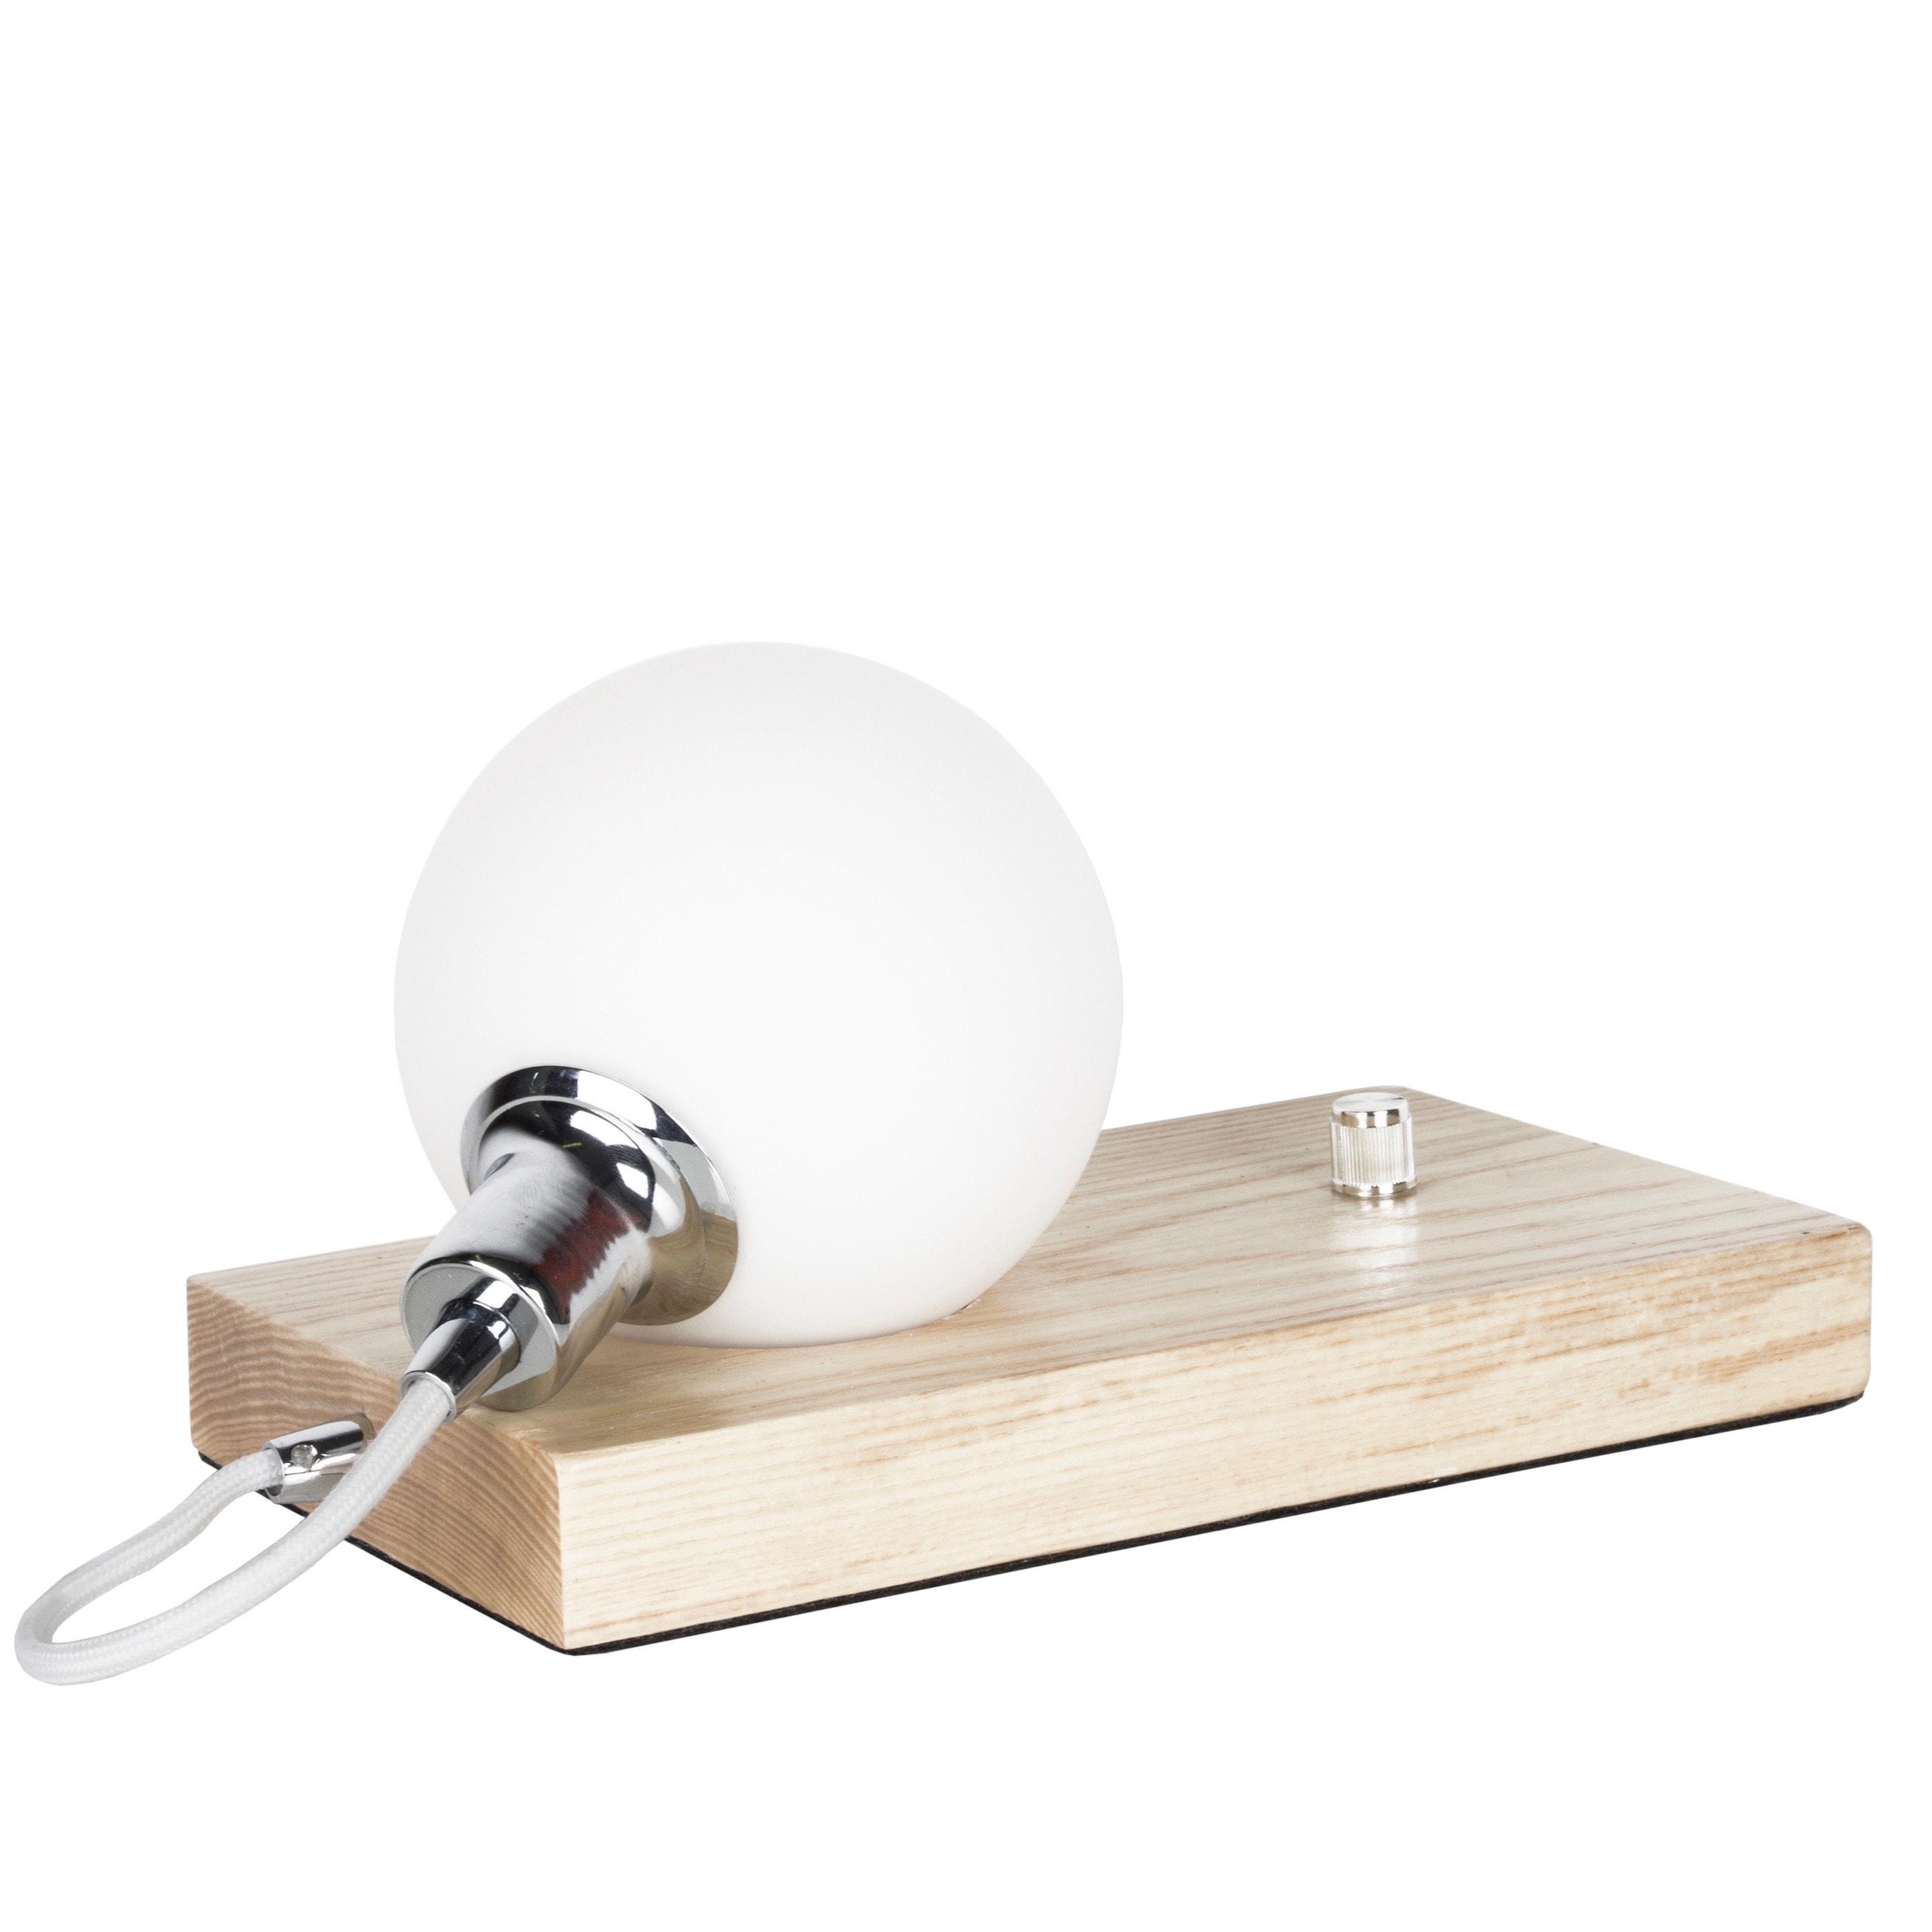 Orb bordslampa ask